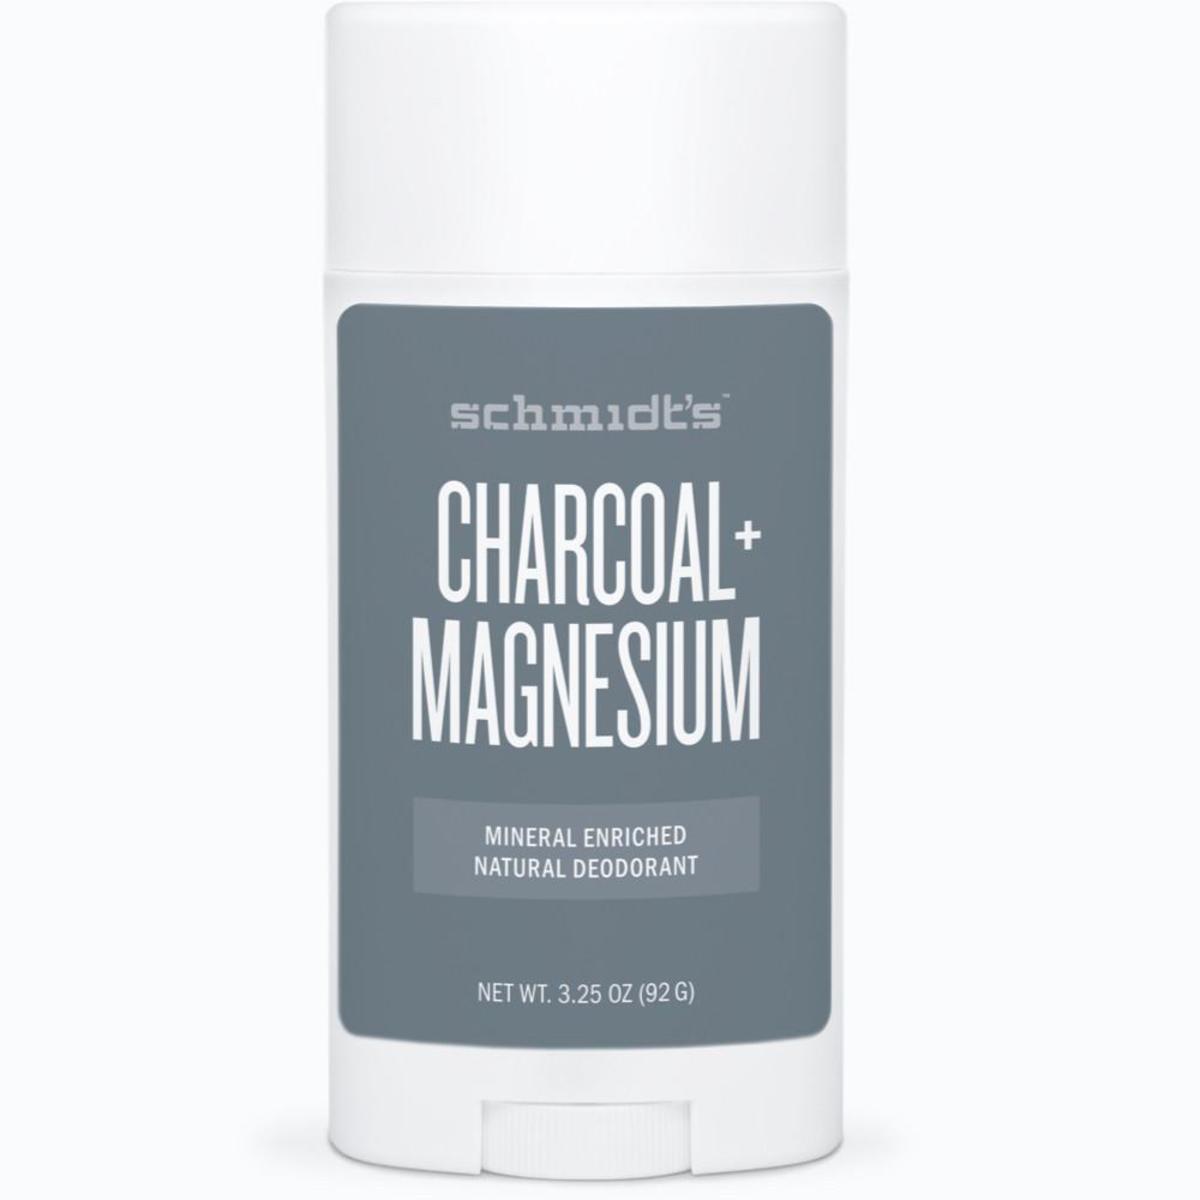 Schmidts Characoal Magnesium Deodorant